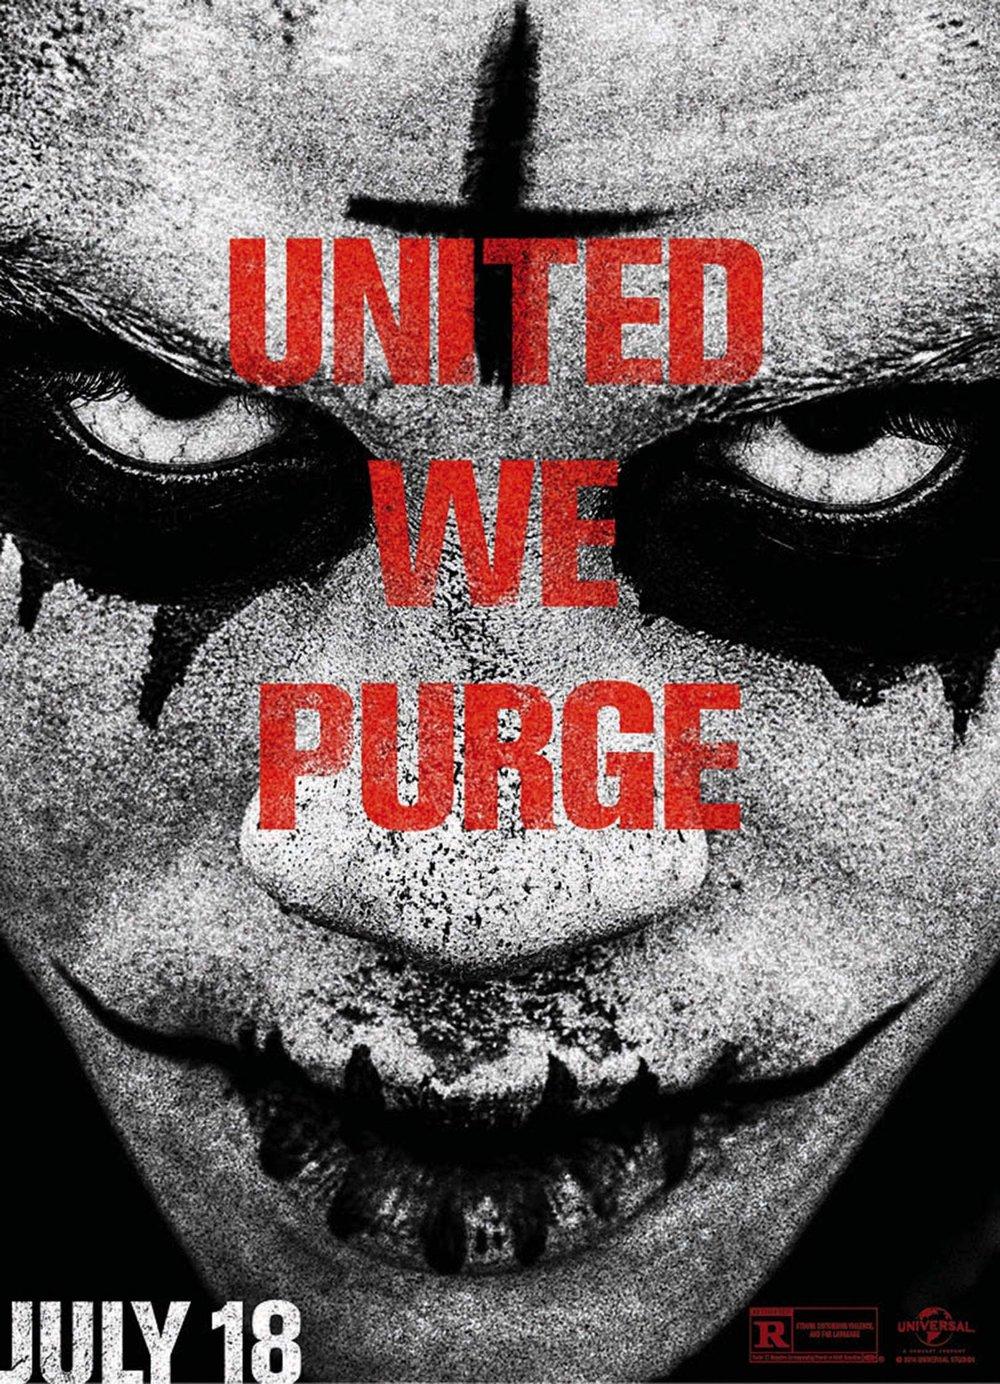 purge_anarchy_ver15_xxlg.jpg